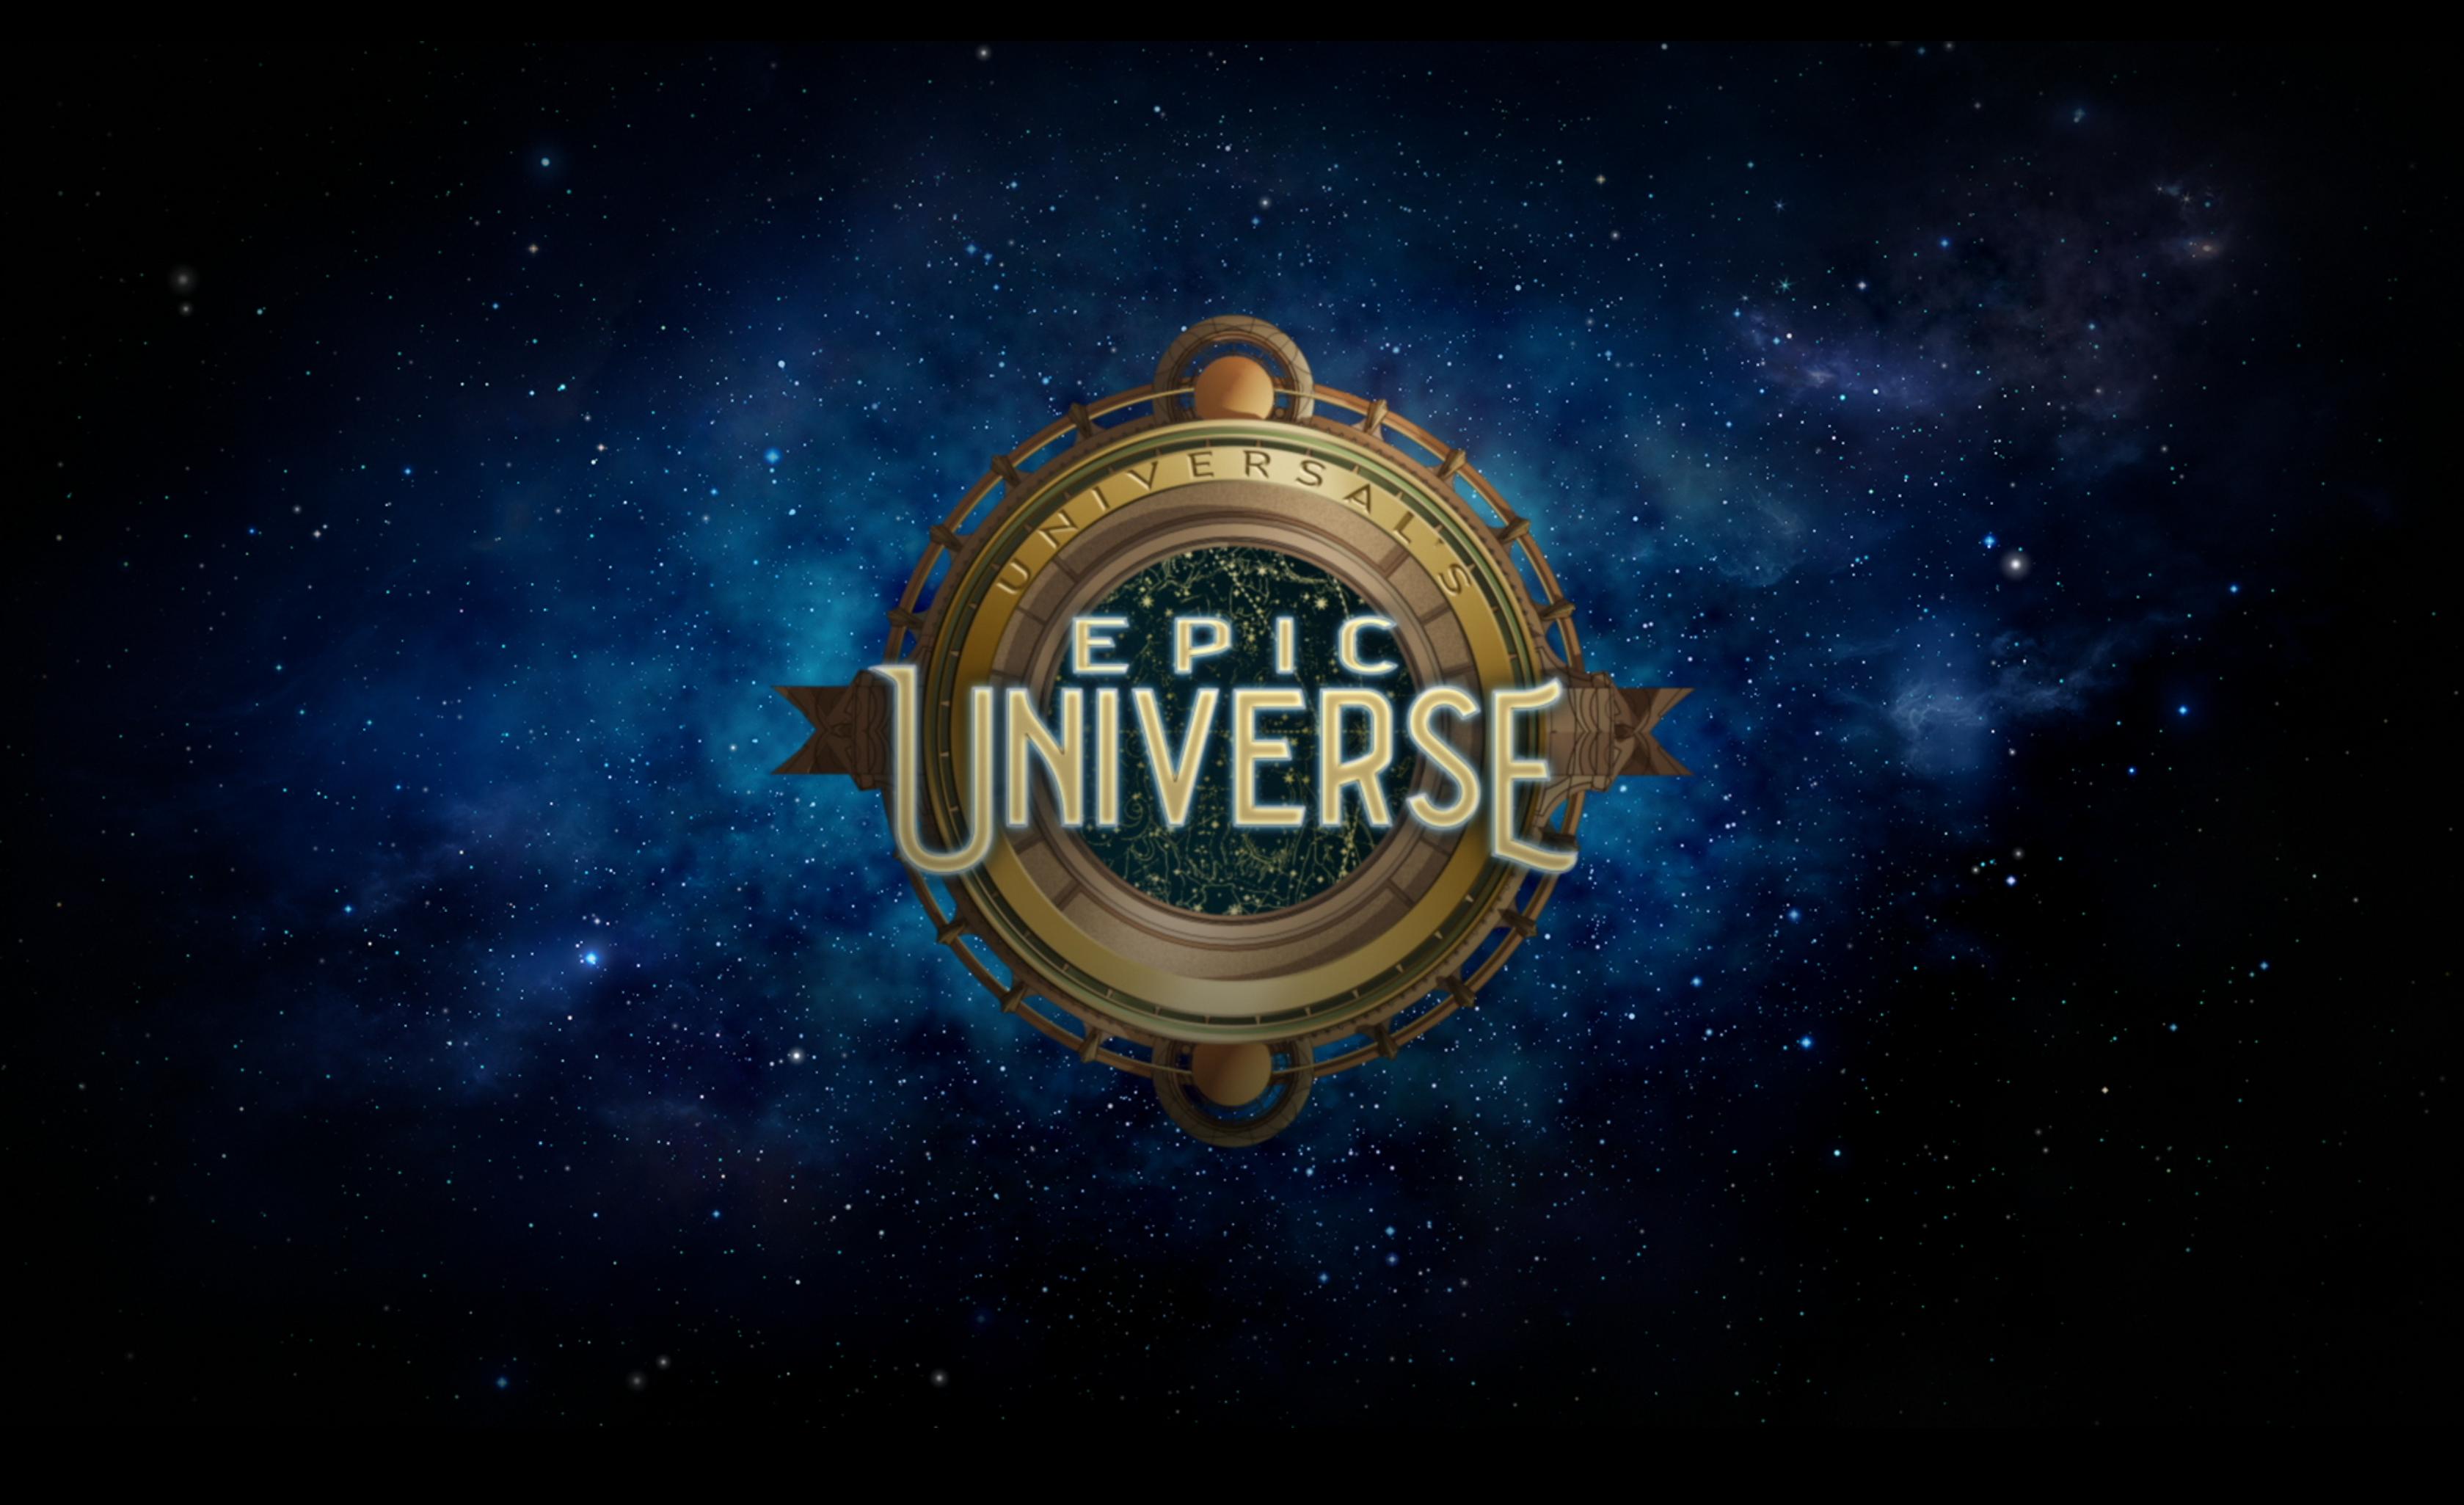 Epic Universe logo.